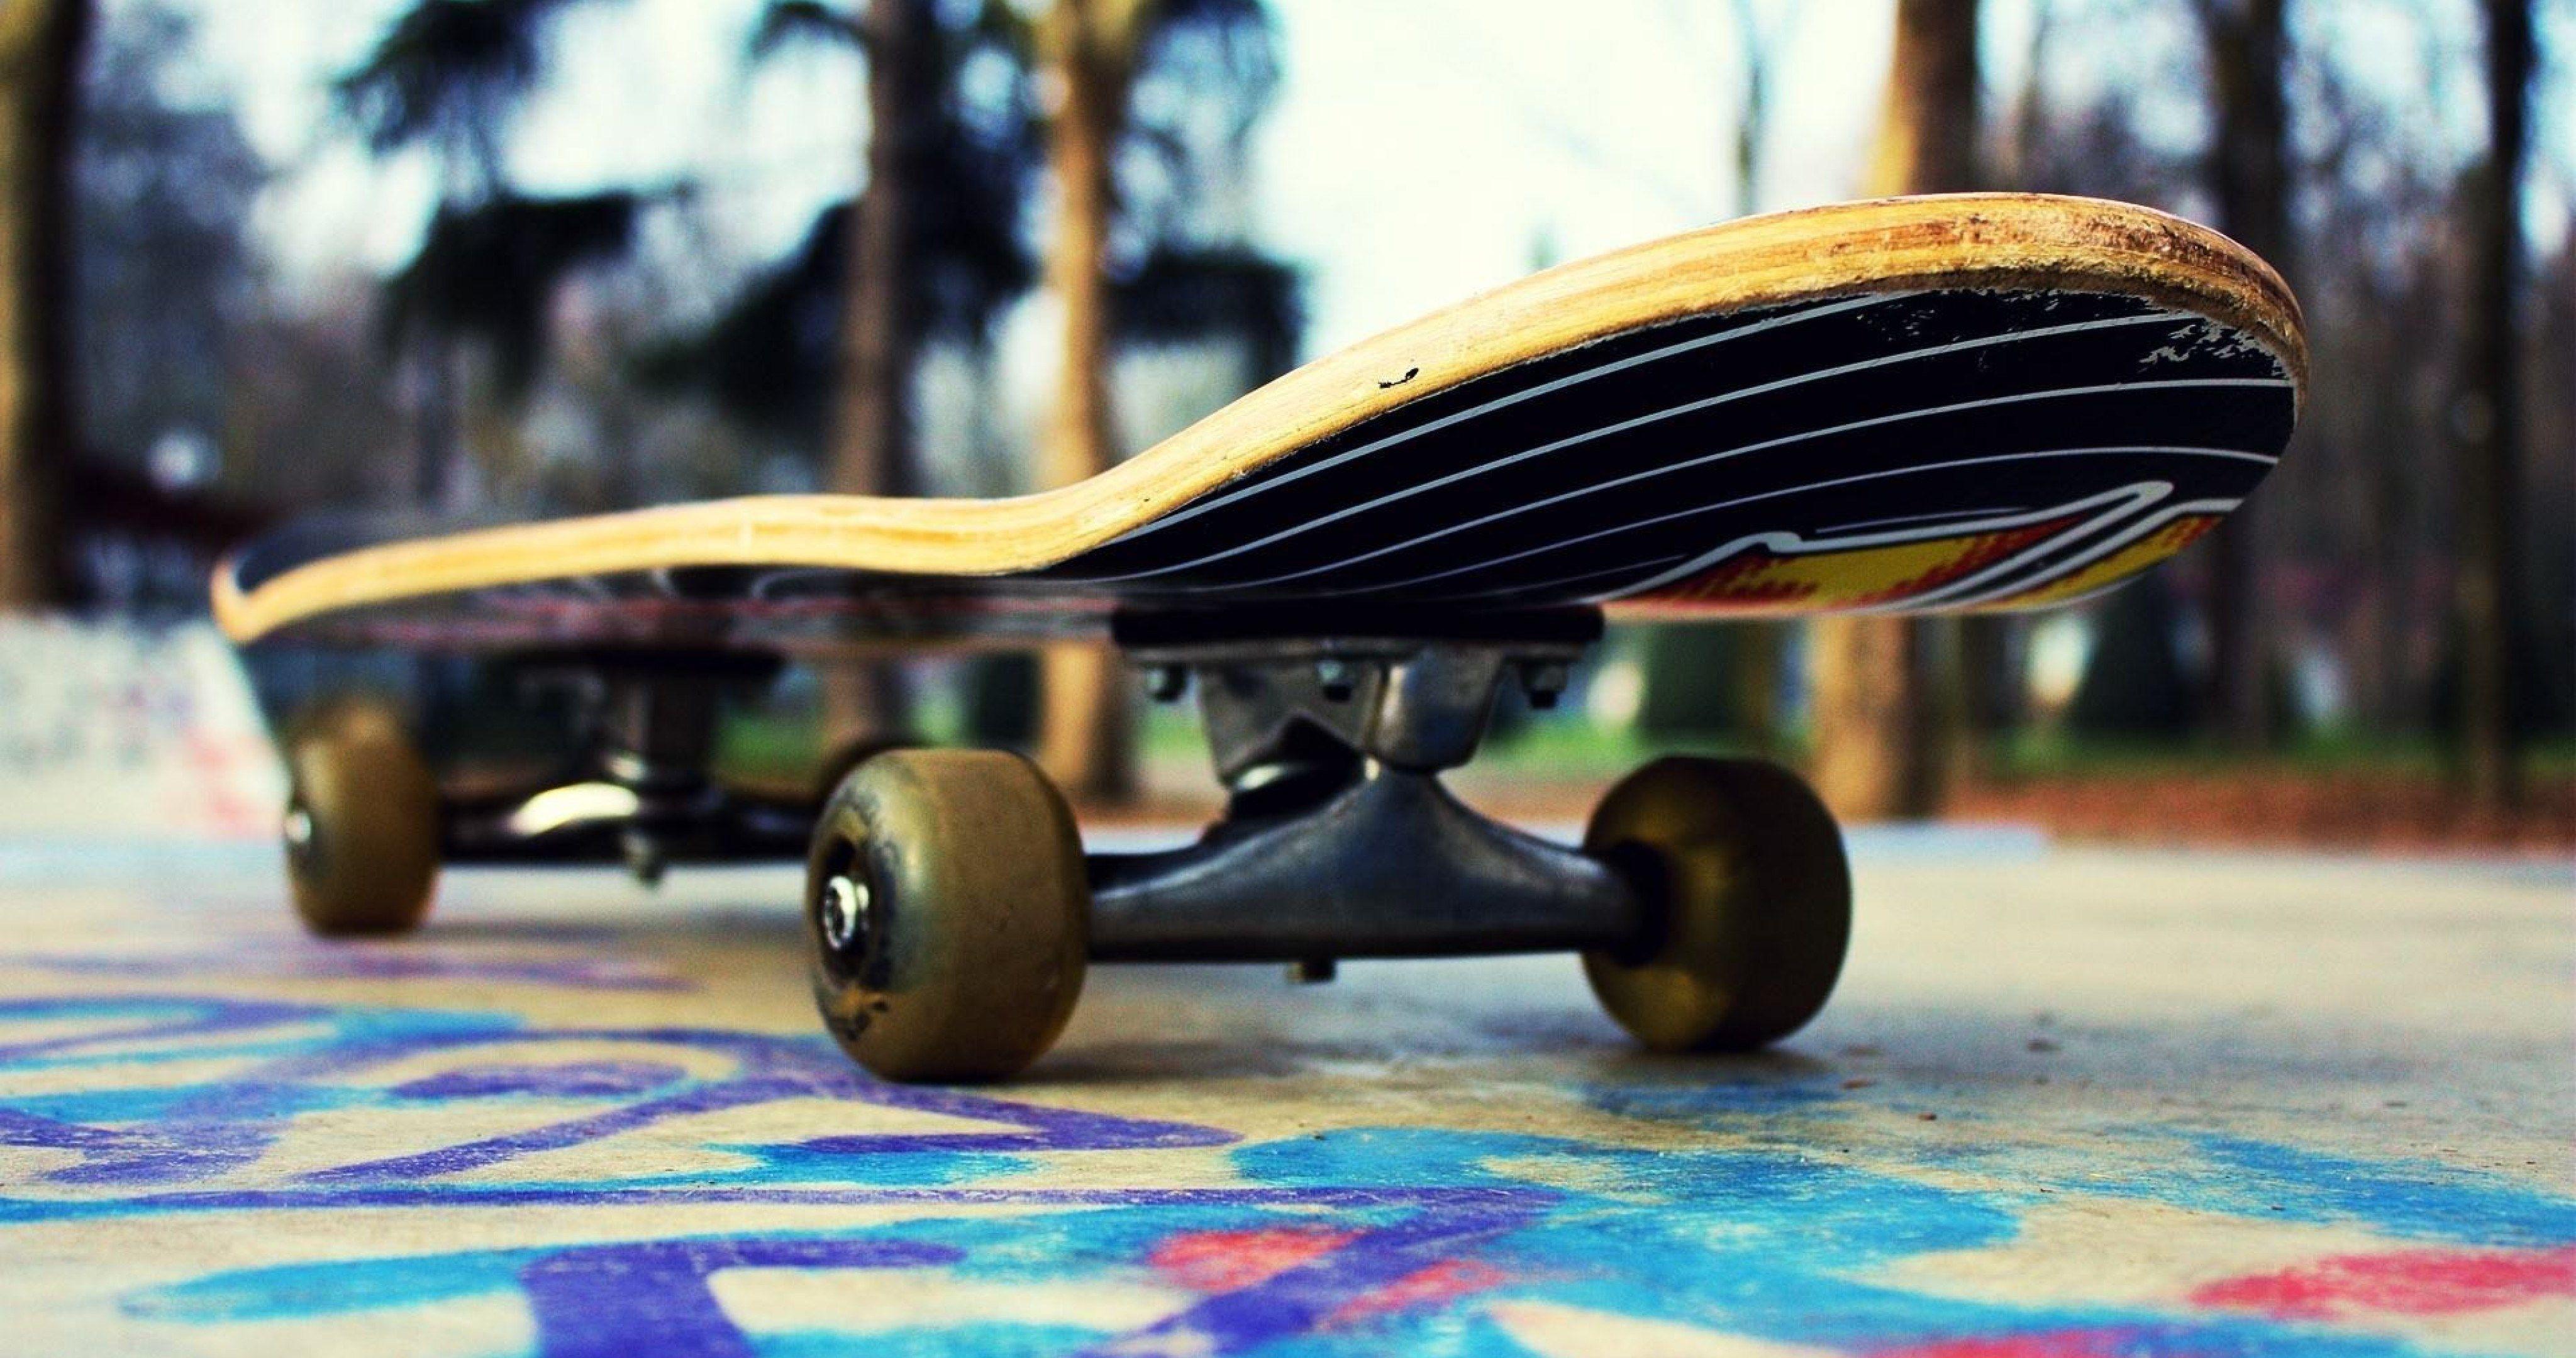 skate board 4k ultra hd wallpaper ololoshenka